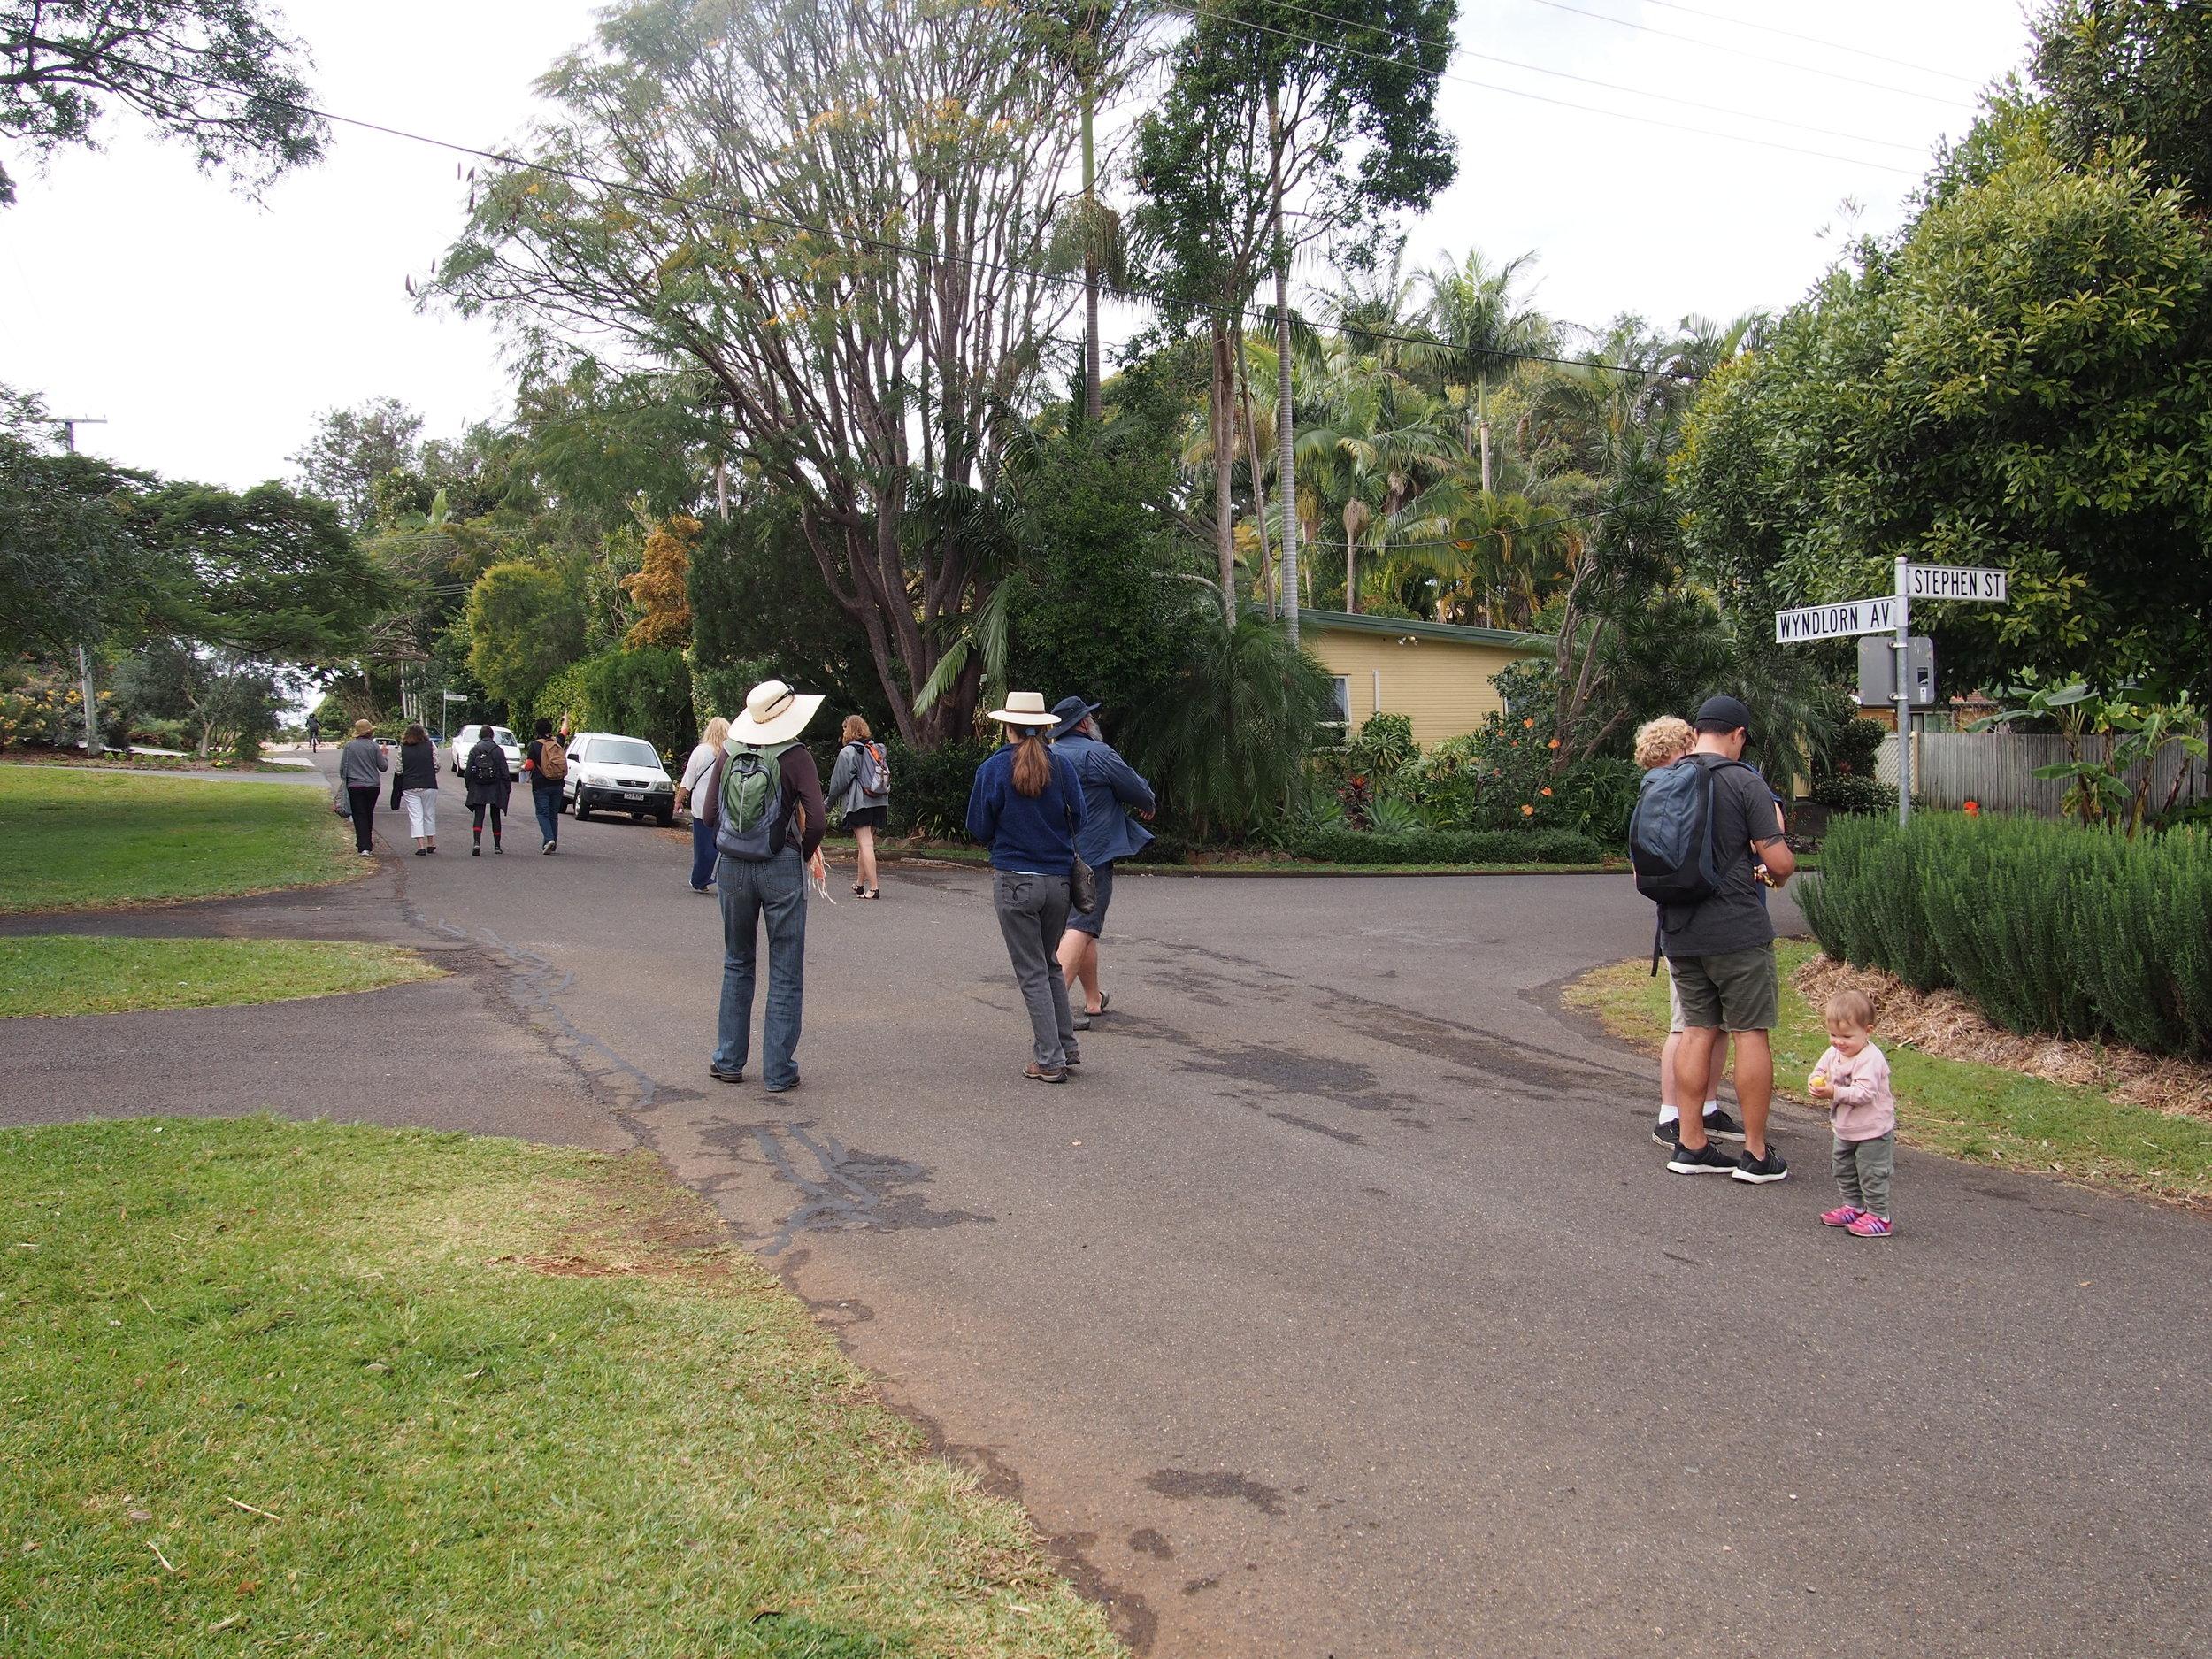 Group of local and international tourists walk the Urban Food Street neighbourhood